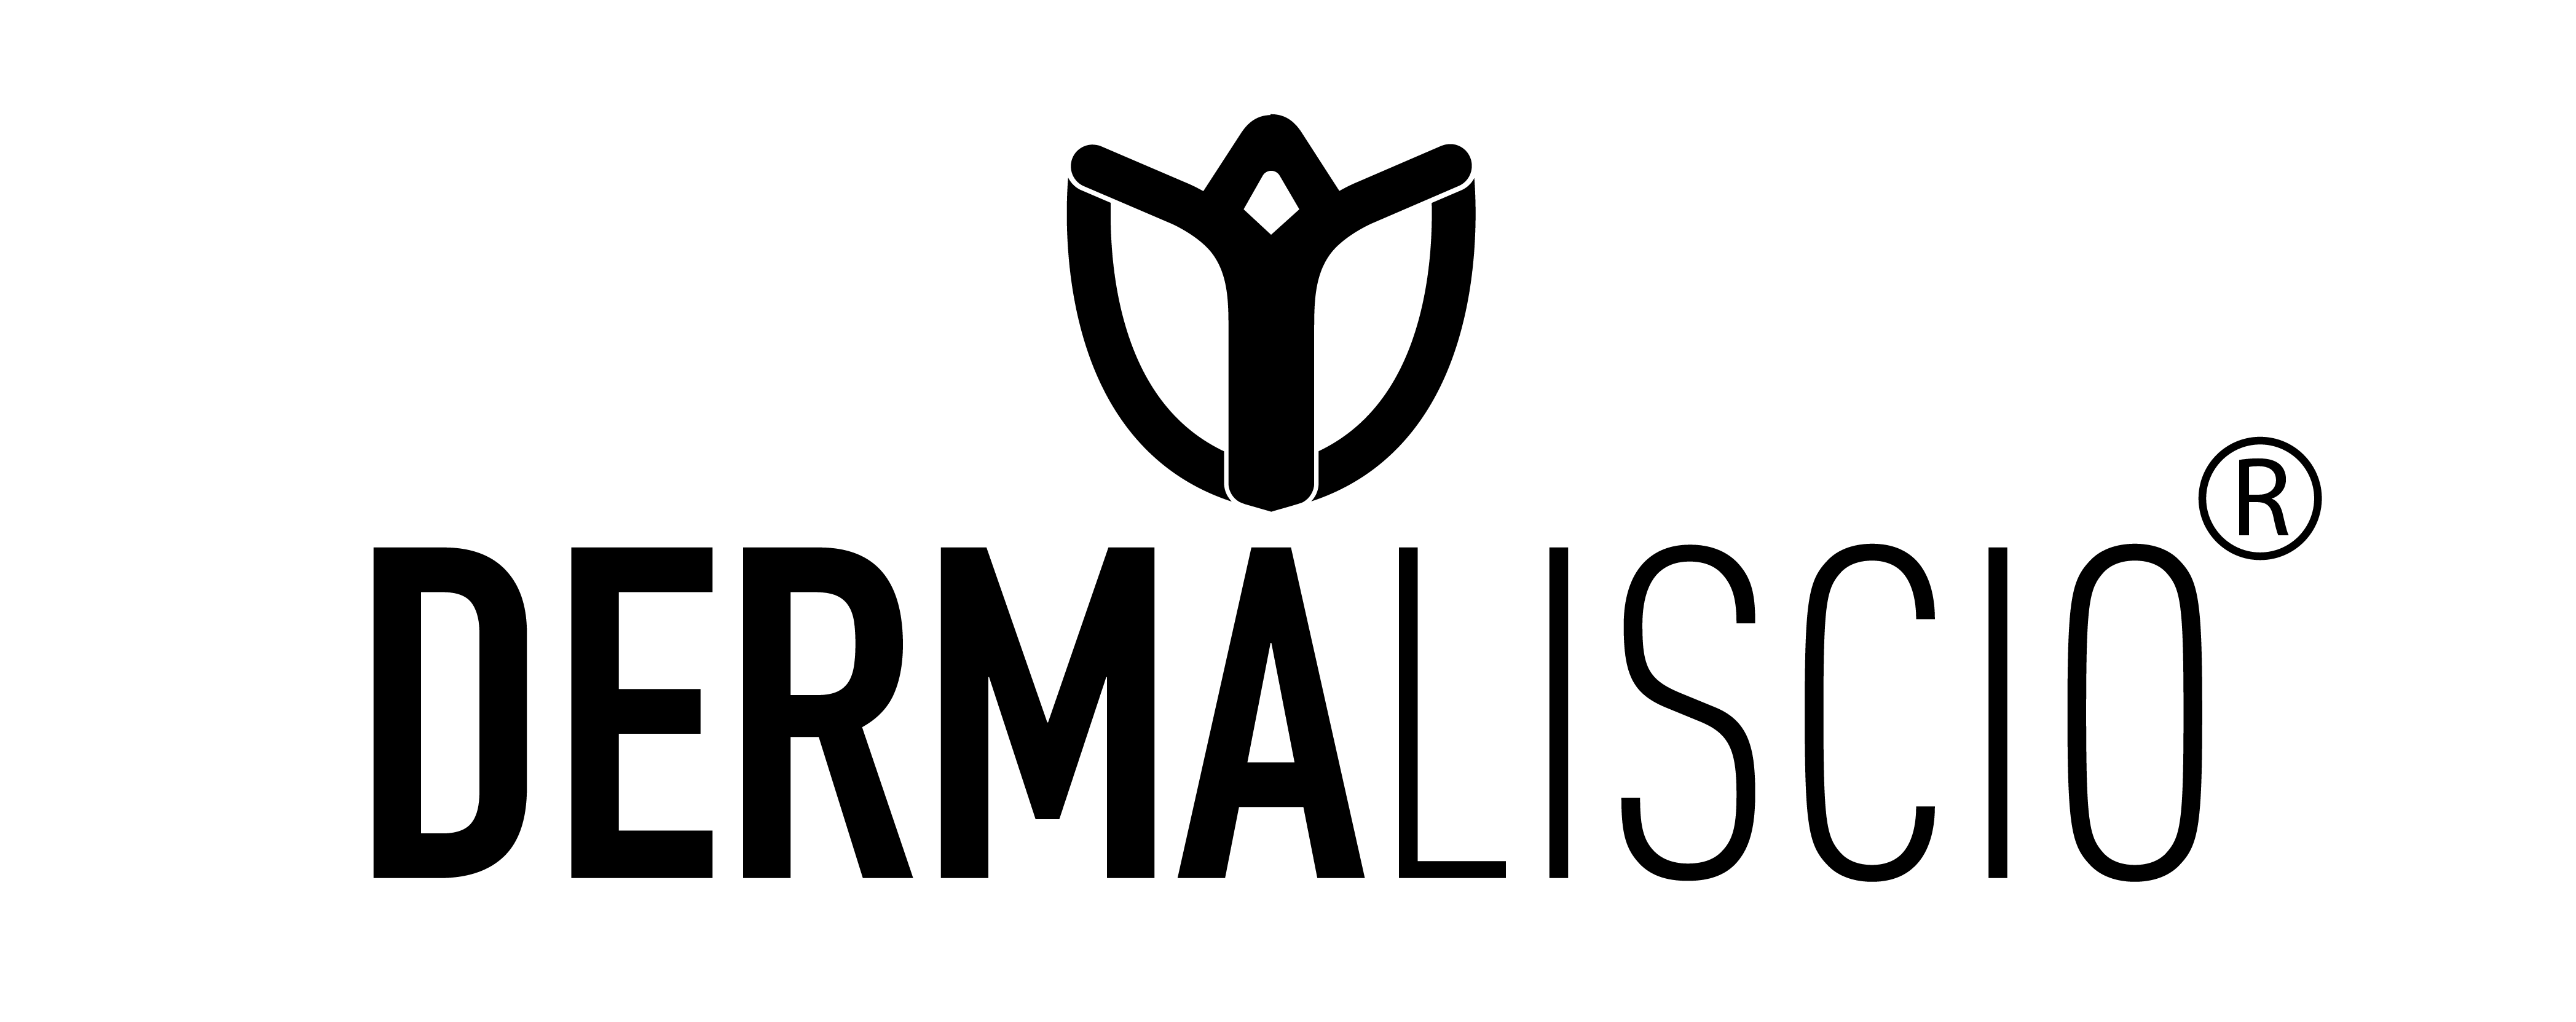 dermaliscio